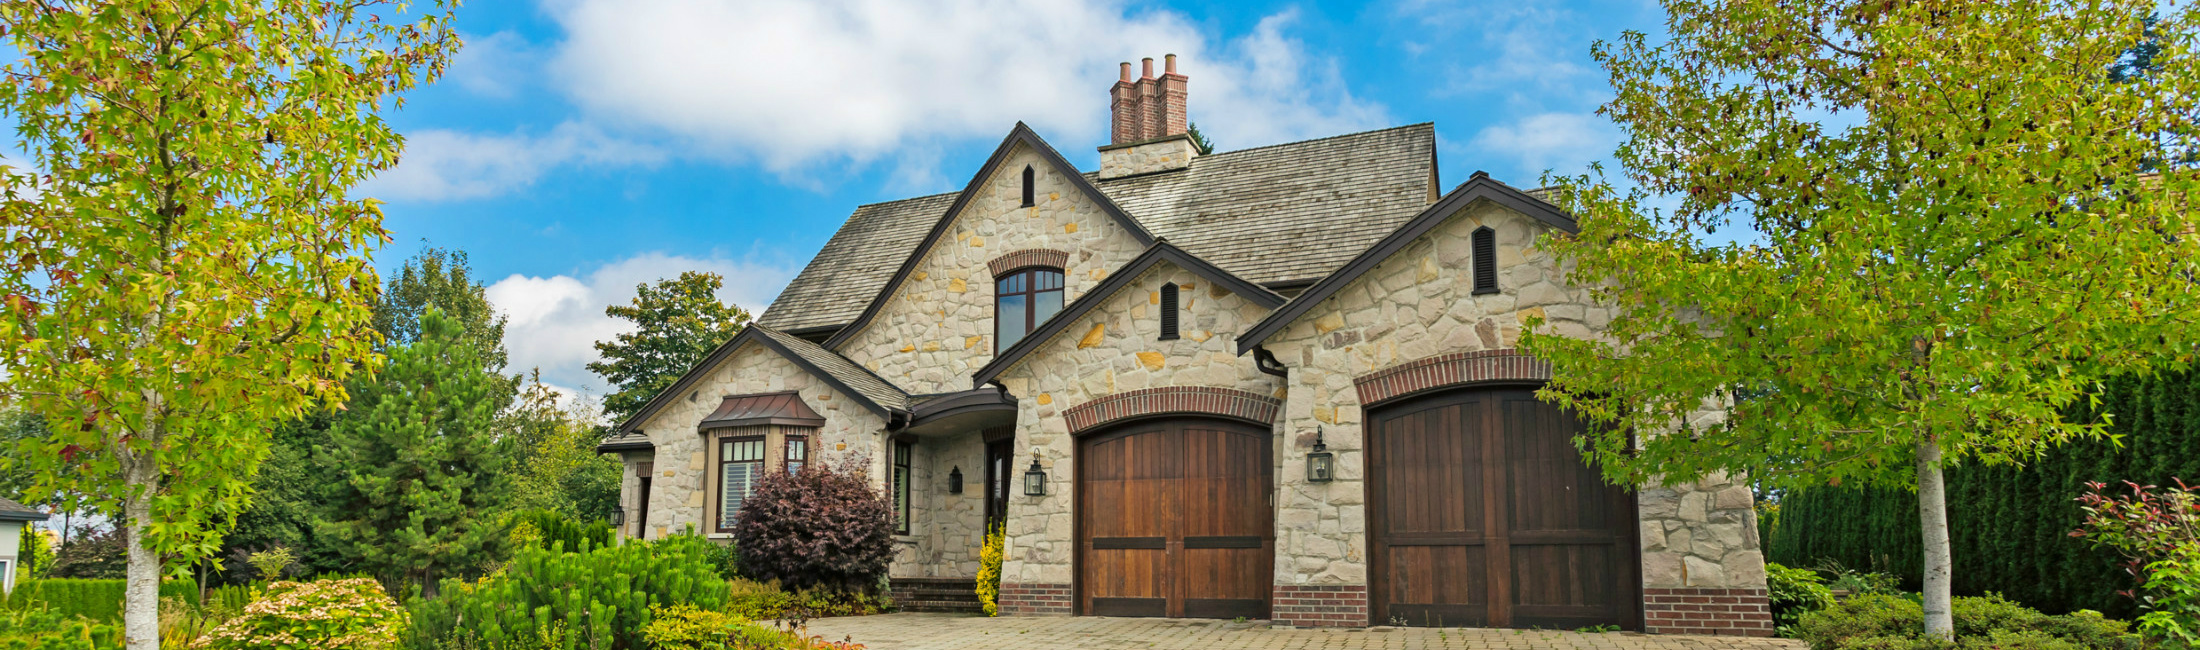 San Antonio Houses For Sale House Plan 2017